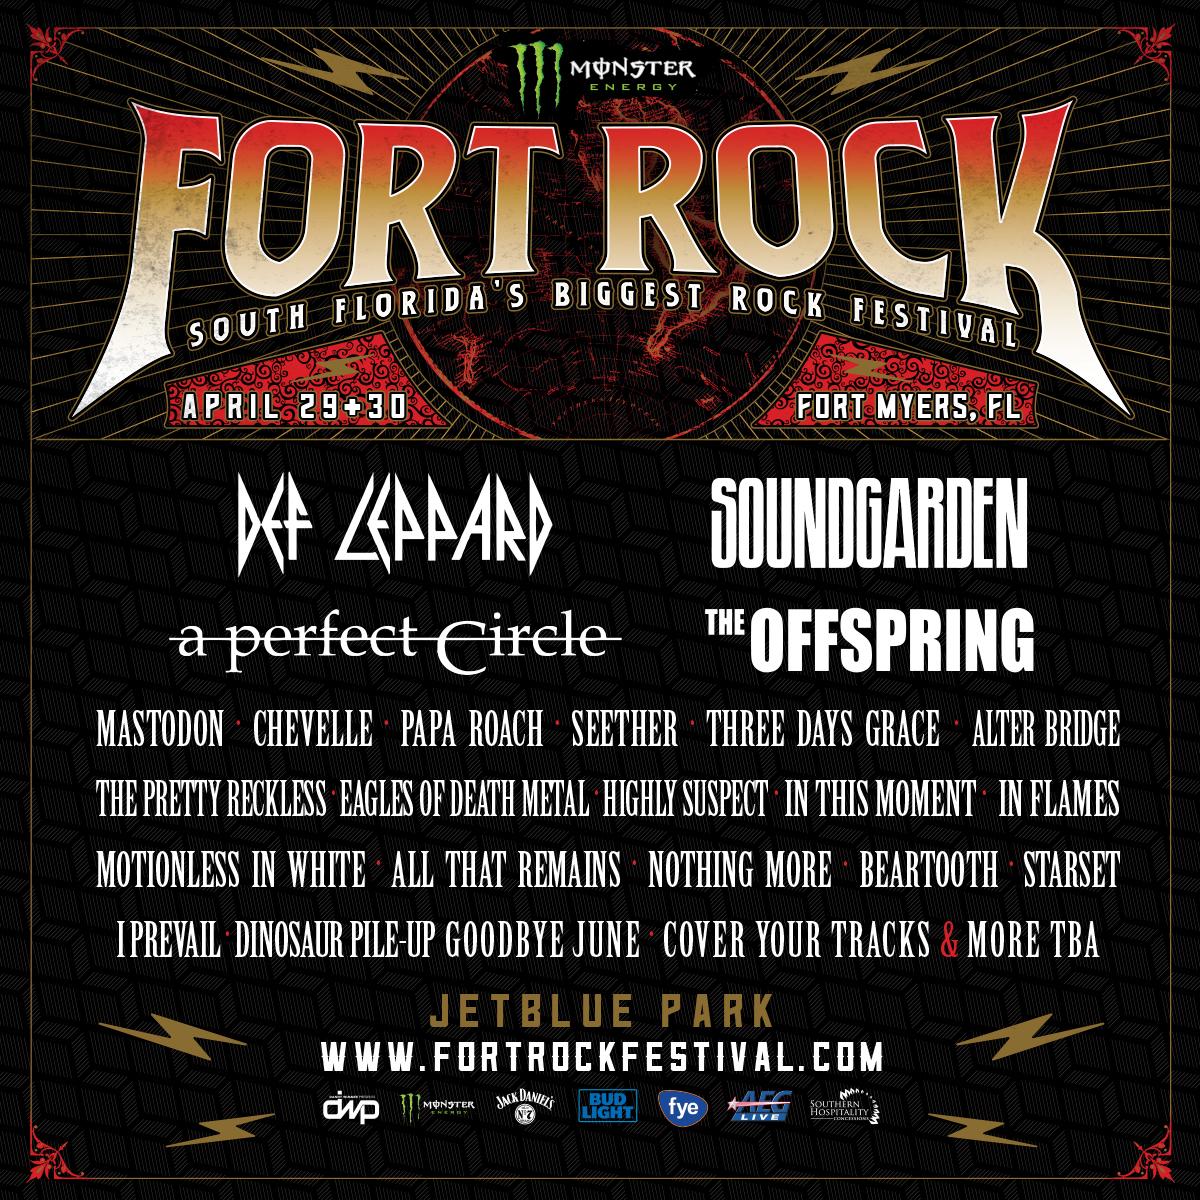 https://threedaysgrace.com/2016/12/08/new-show-fort-meyers-fl-april-29/